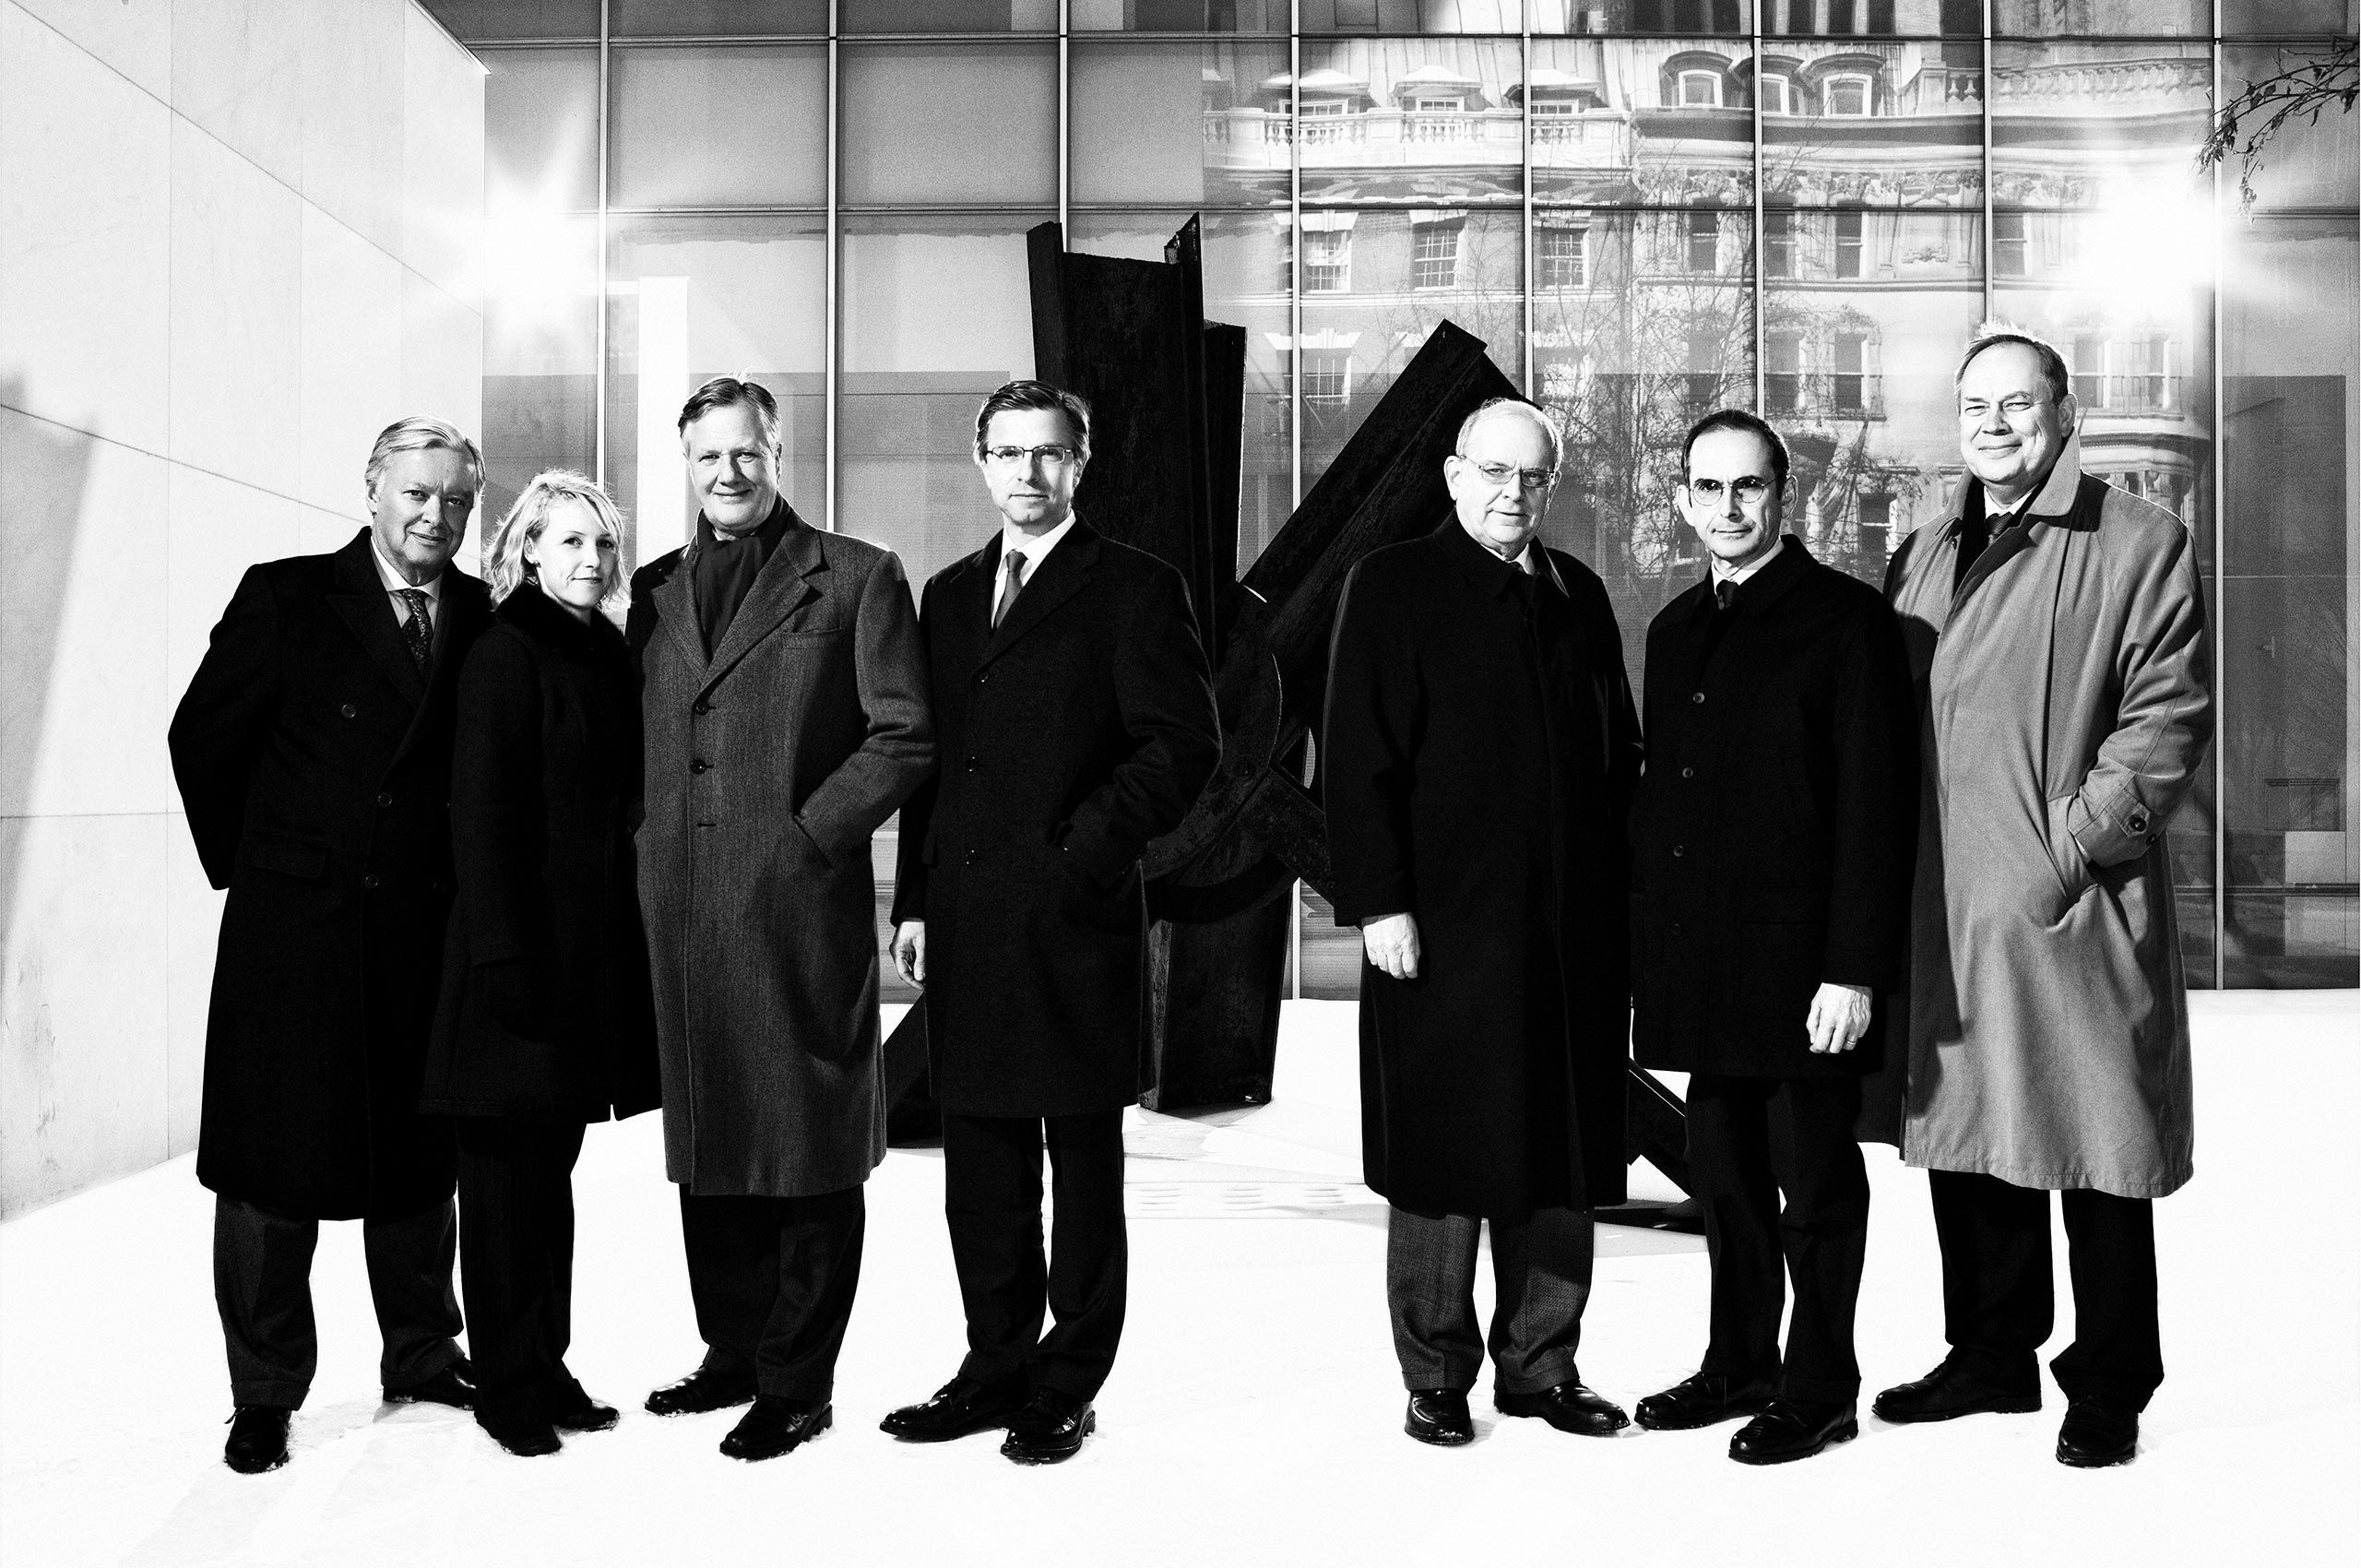 finnish-symposium-group-portrait-HenrikOlundPhotography.jpg